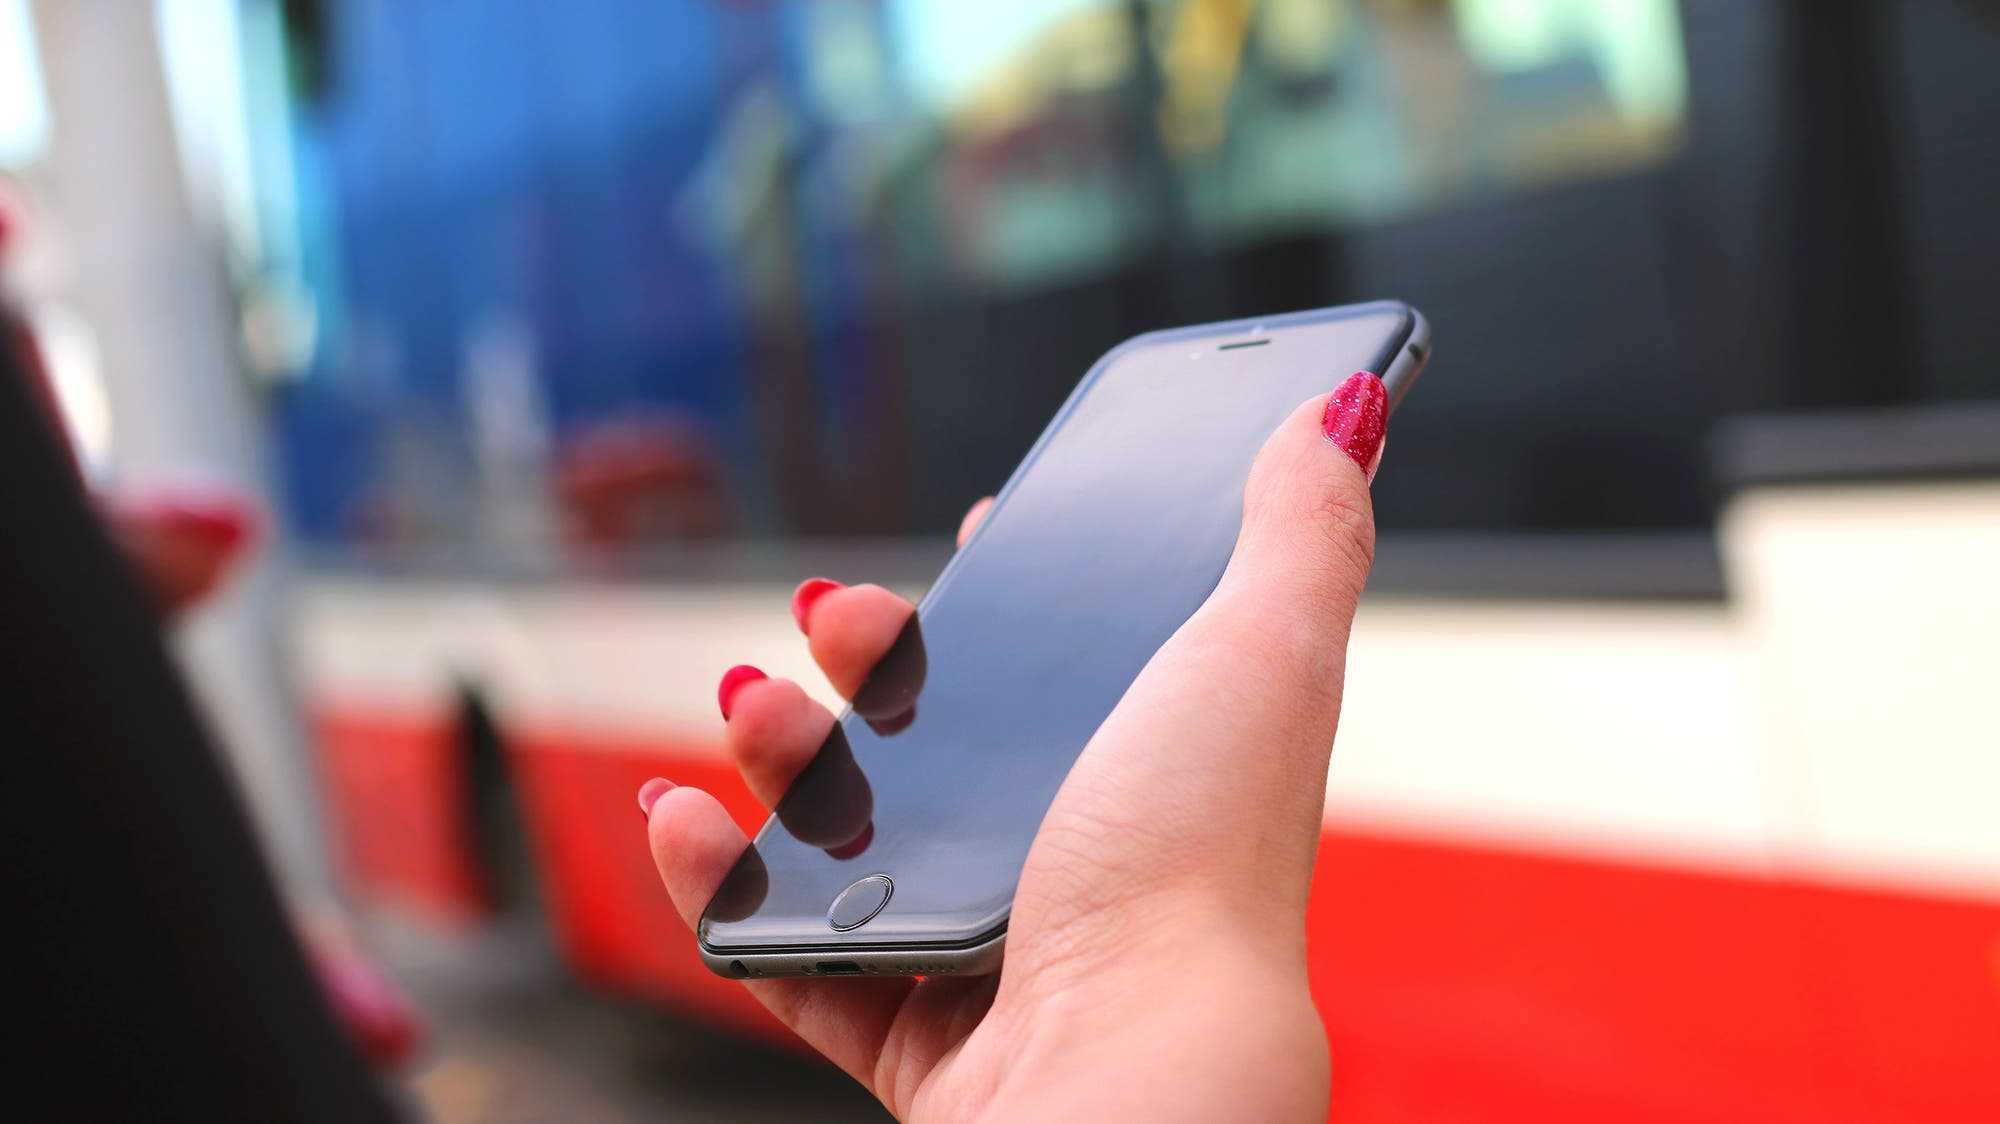 Ocho consejos simples para no volver a romper el celular